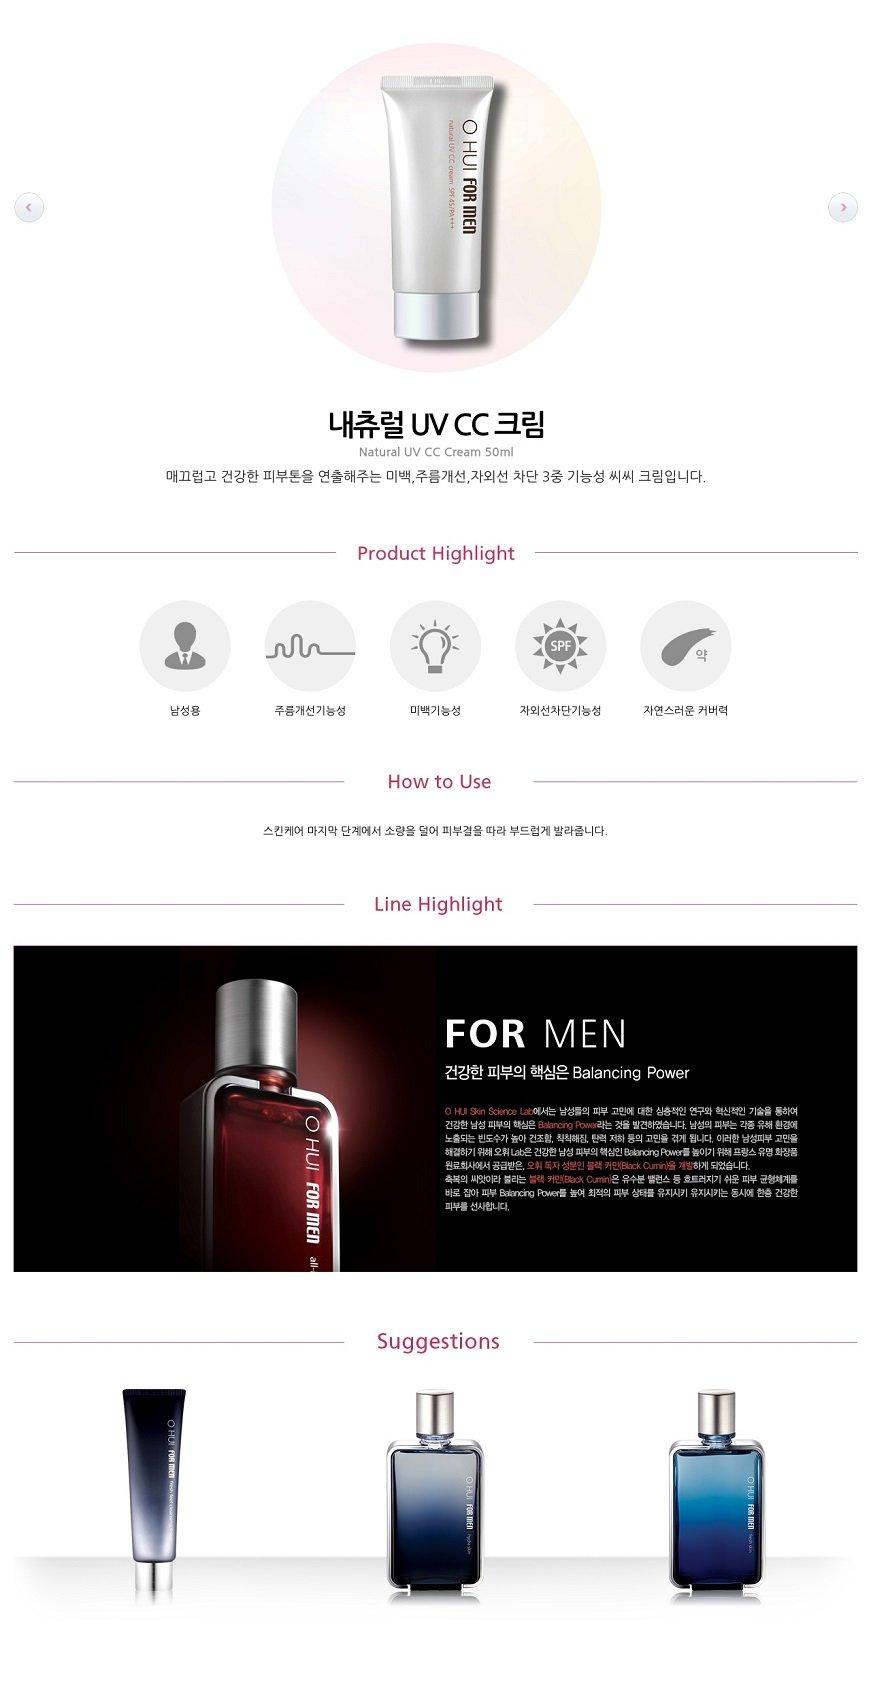 OHUI FOR MEN Natural UV CC Cream 50ml malaysia singapore indonesia